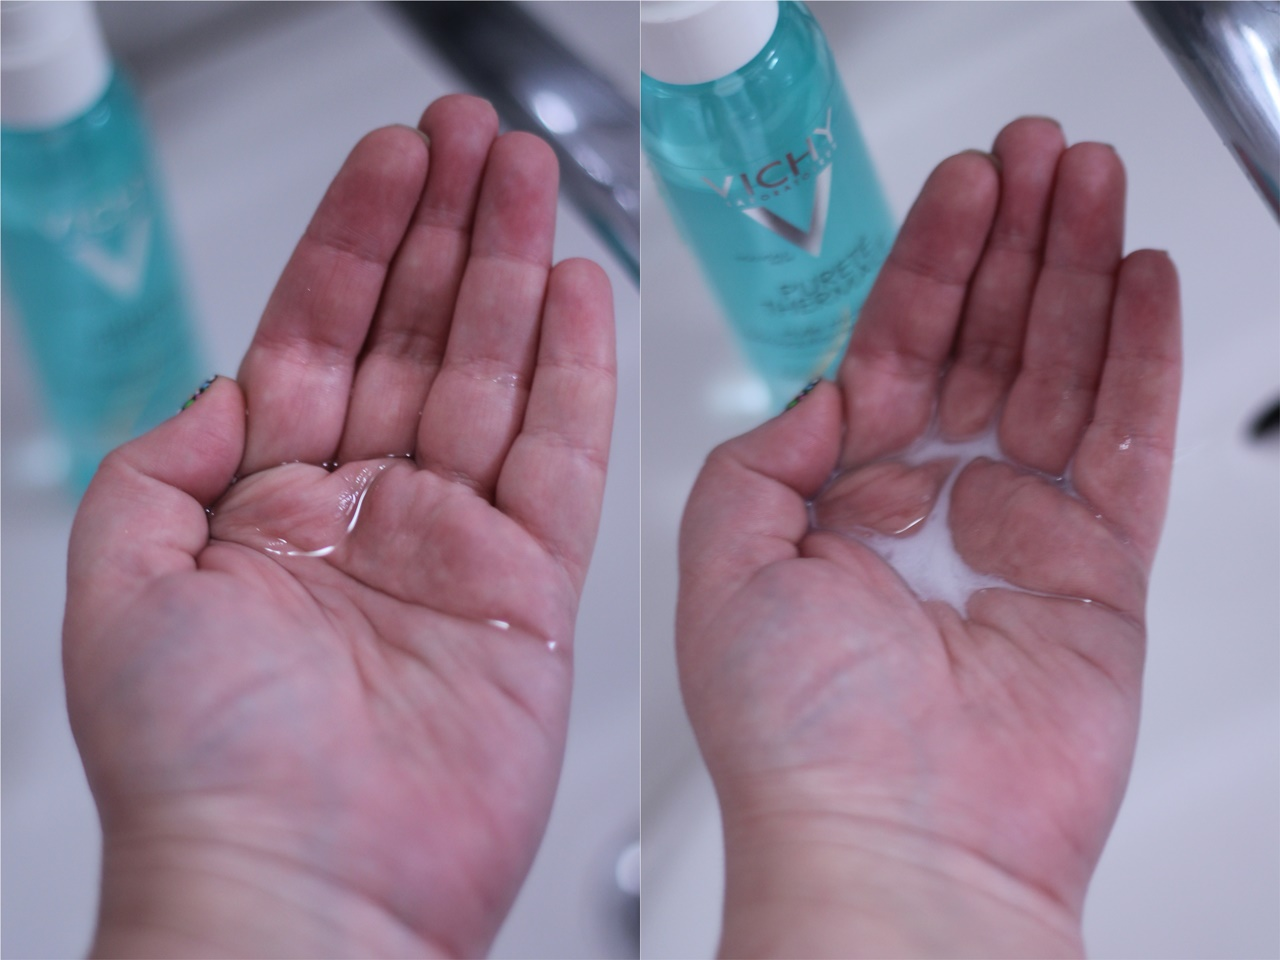 Vichy-Pureté-Thermale-Ulei-Micelar-Demachiant-